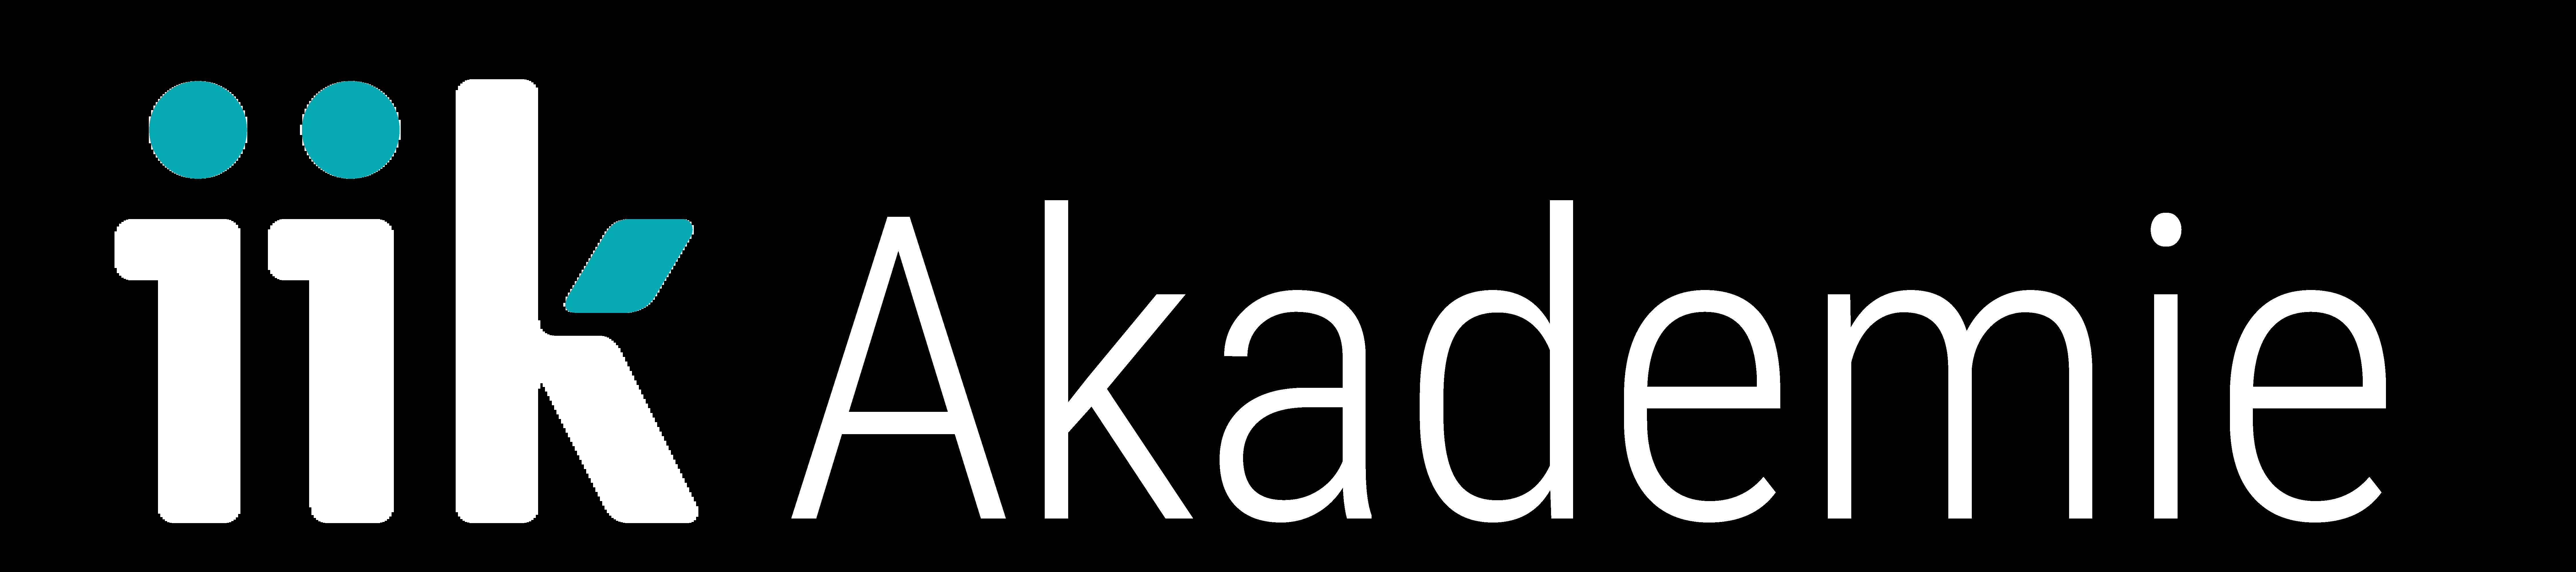 IIK Akademie